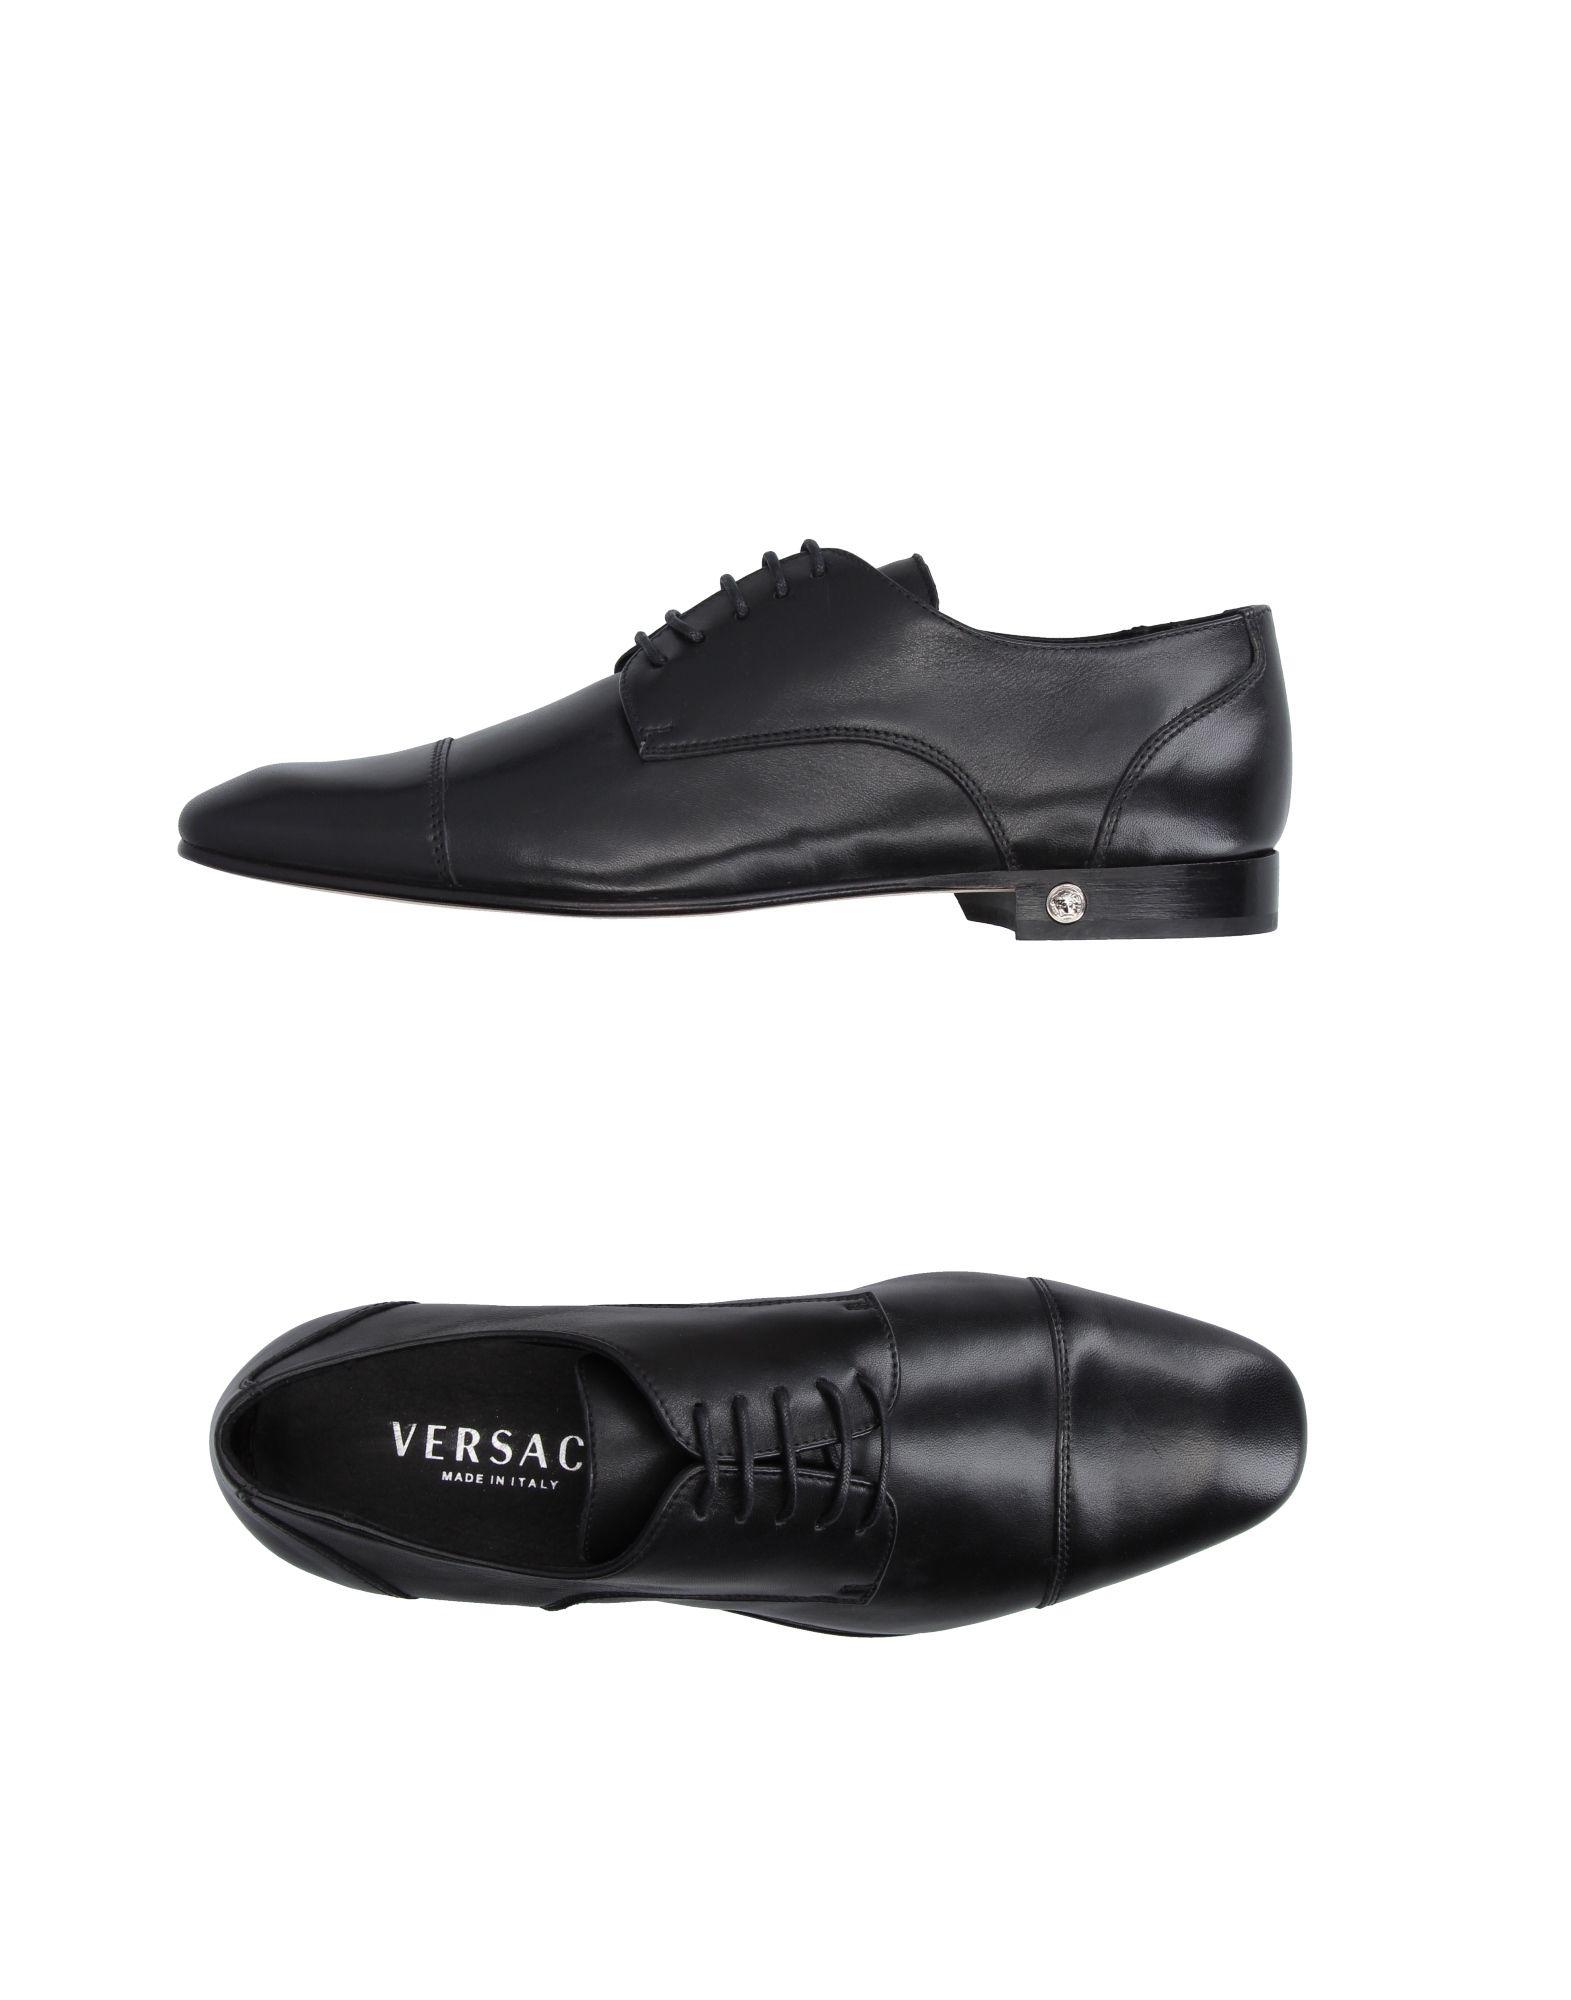 Versace Schnürschuhe Herren  11221364KE Gute Qualität beliebte Schuhe